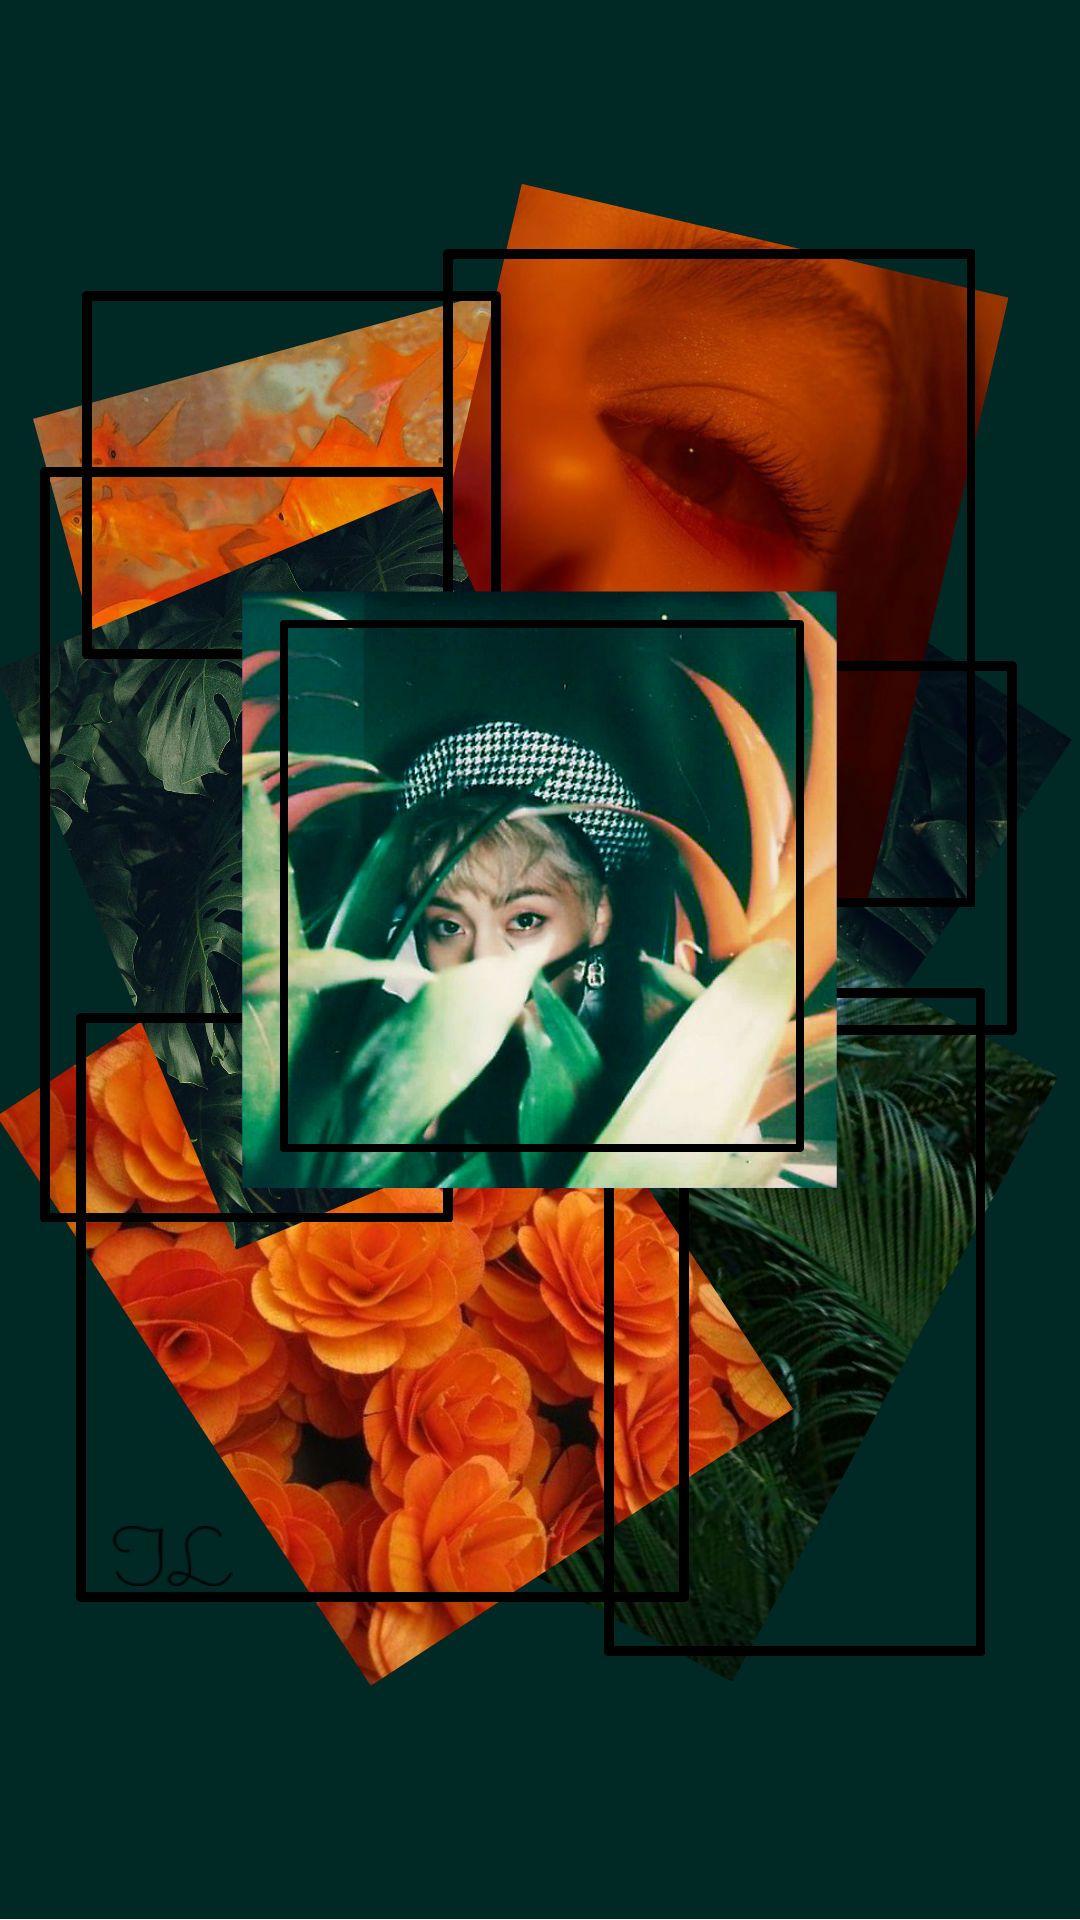 Pin by Катя on Exo Wallpaper, Green, Exo